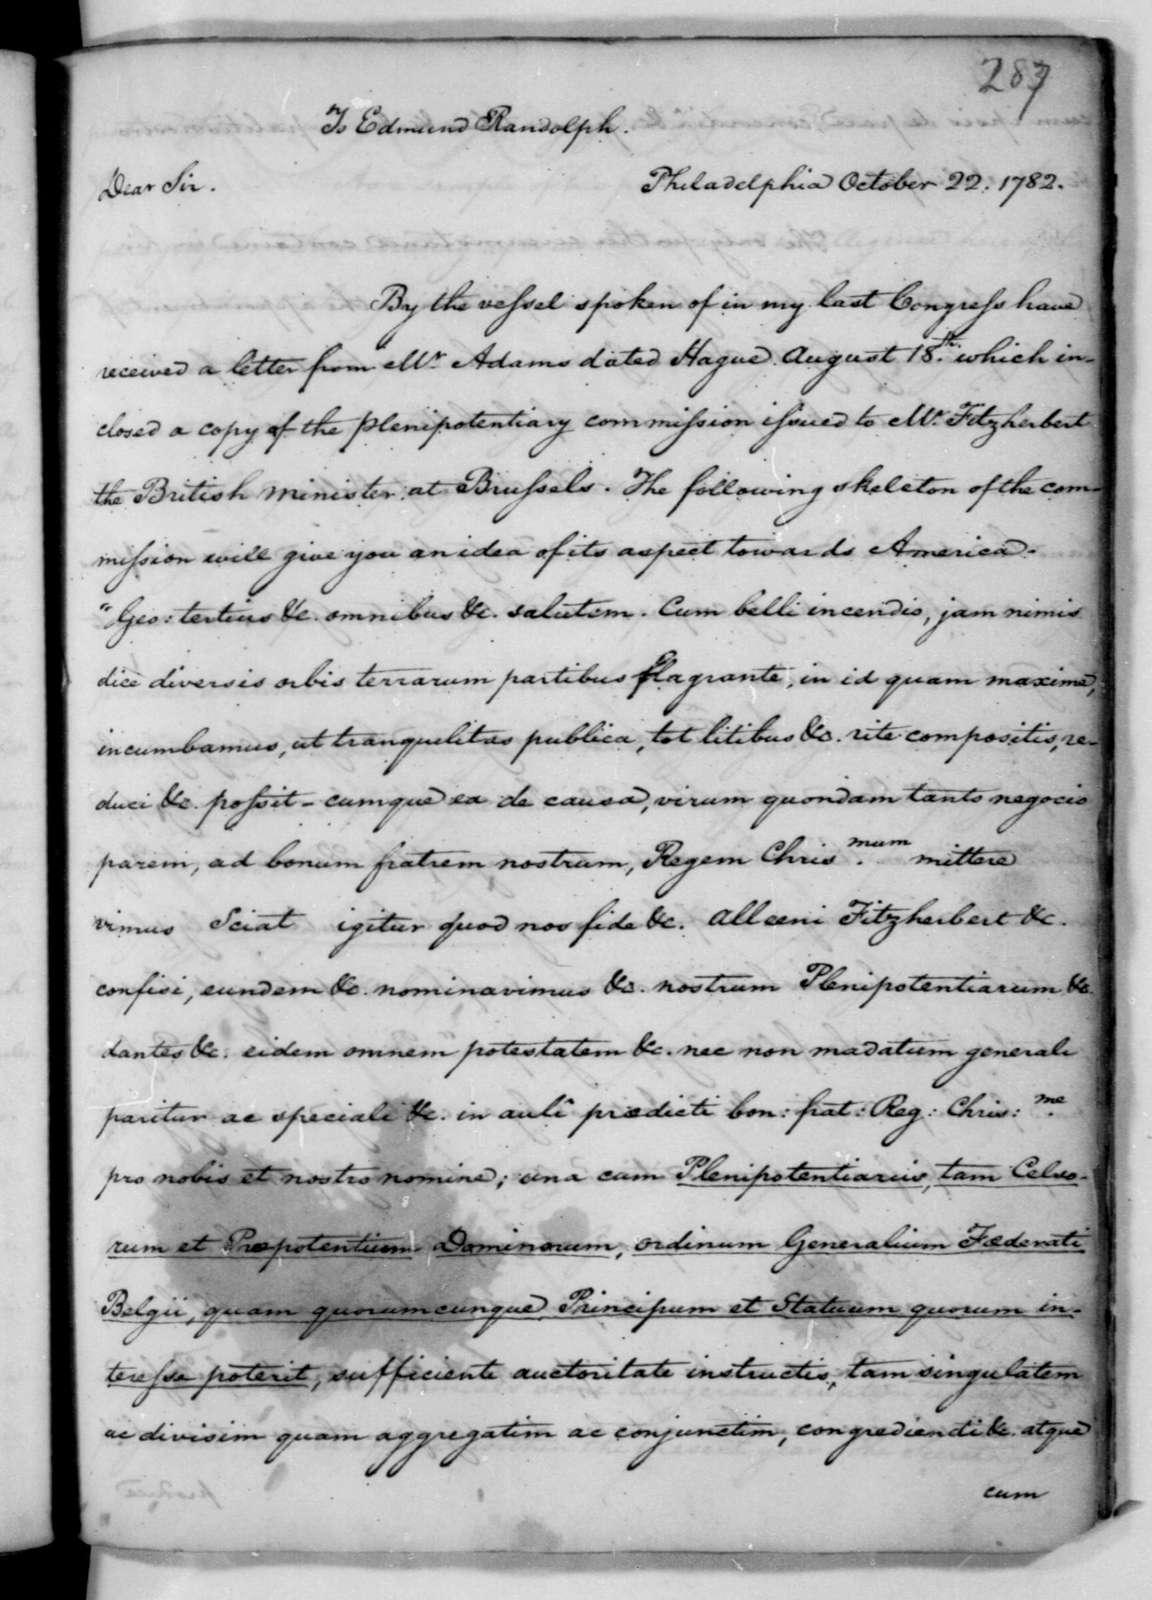 James Madison to Edmund Randolph, October 22, 1782.